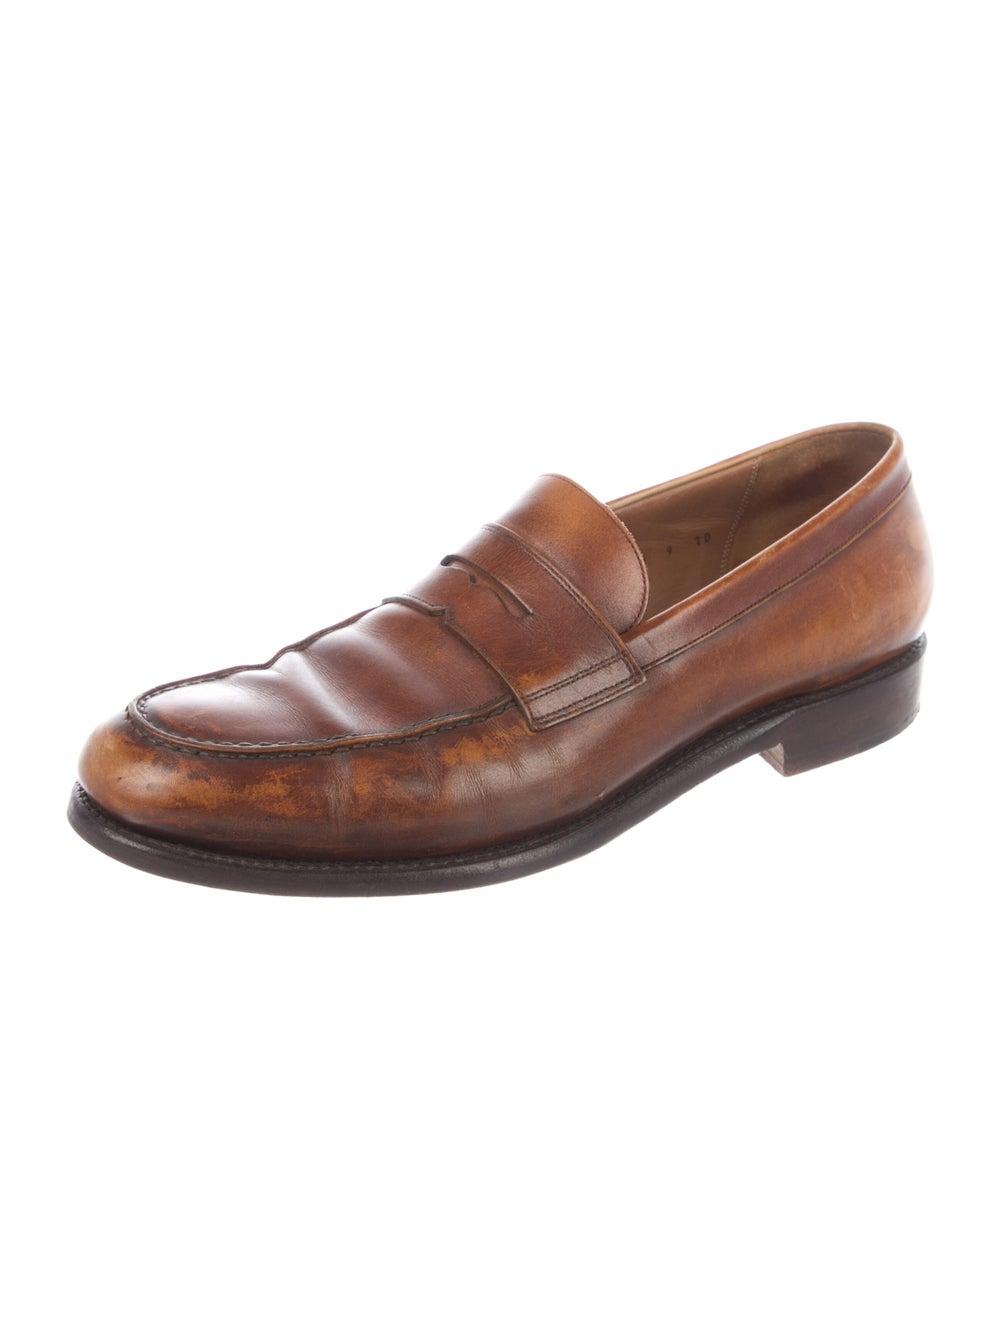 Salvatore Ferragamo Leather Penny Loafers - image 2